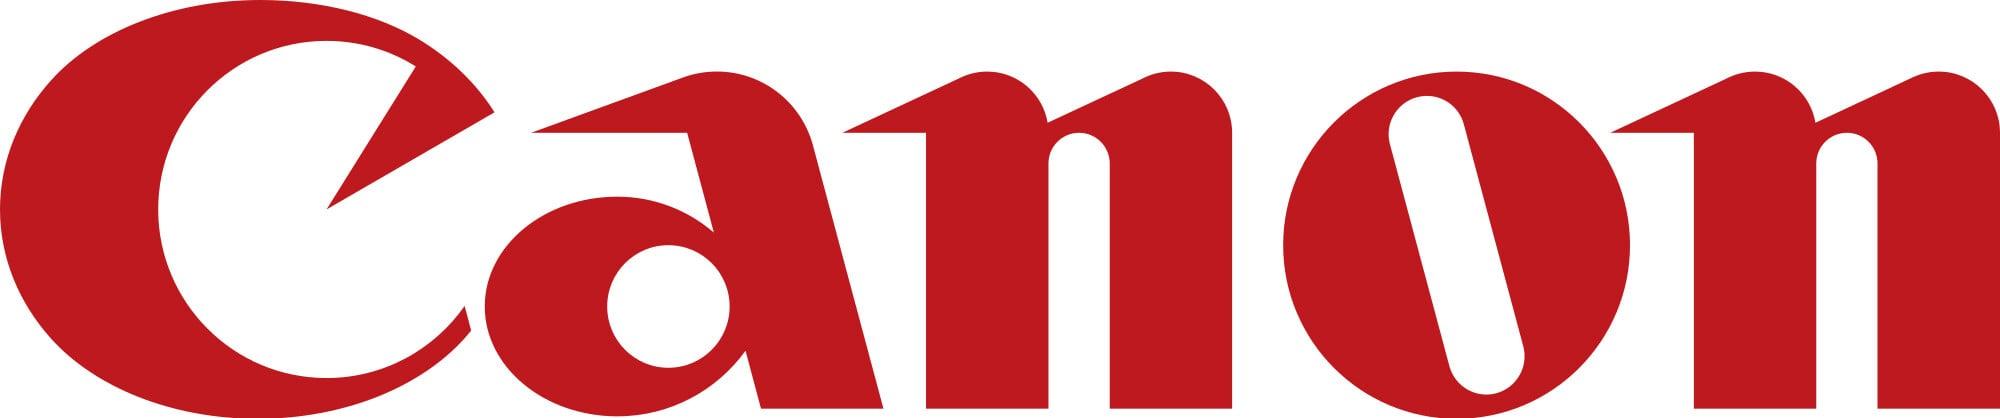 Canon (UK)